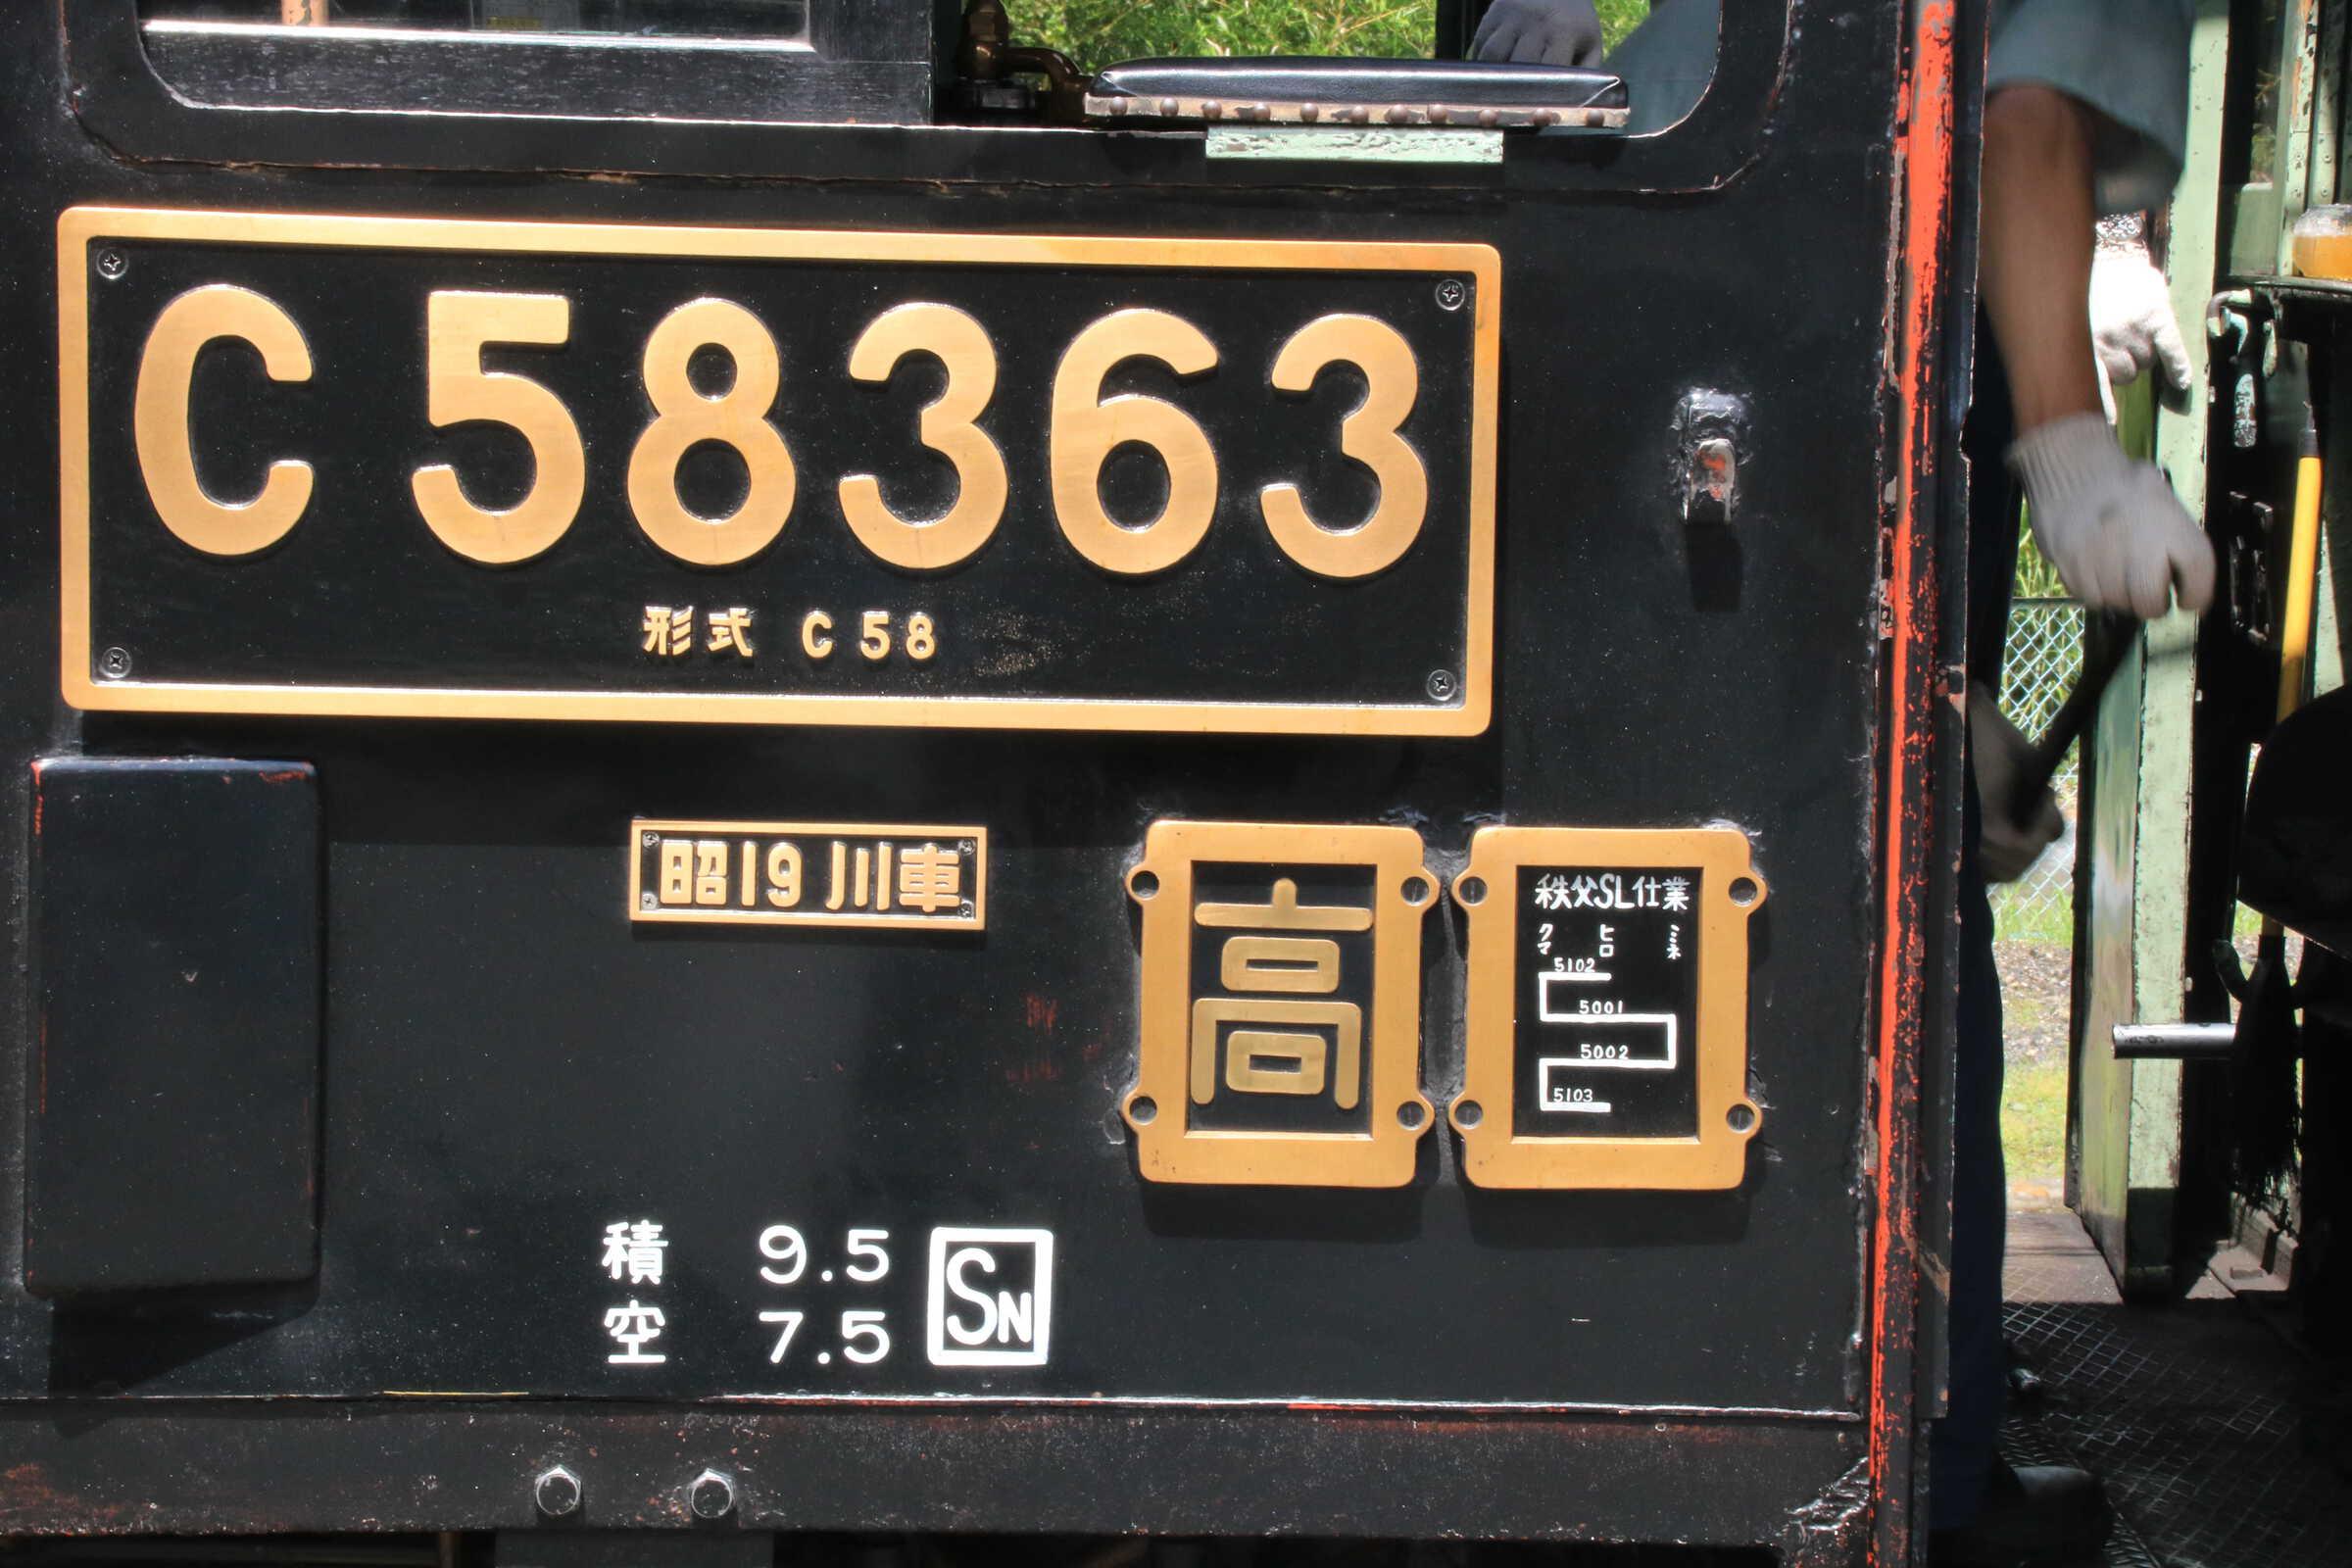 C58363